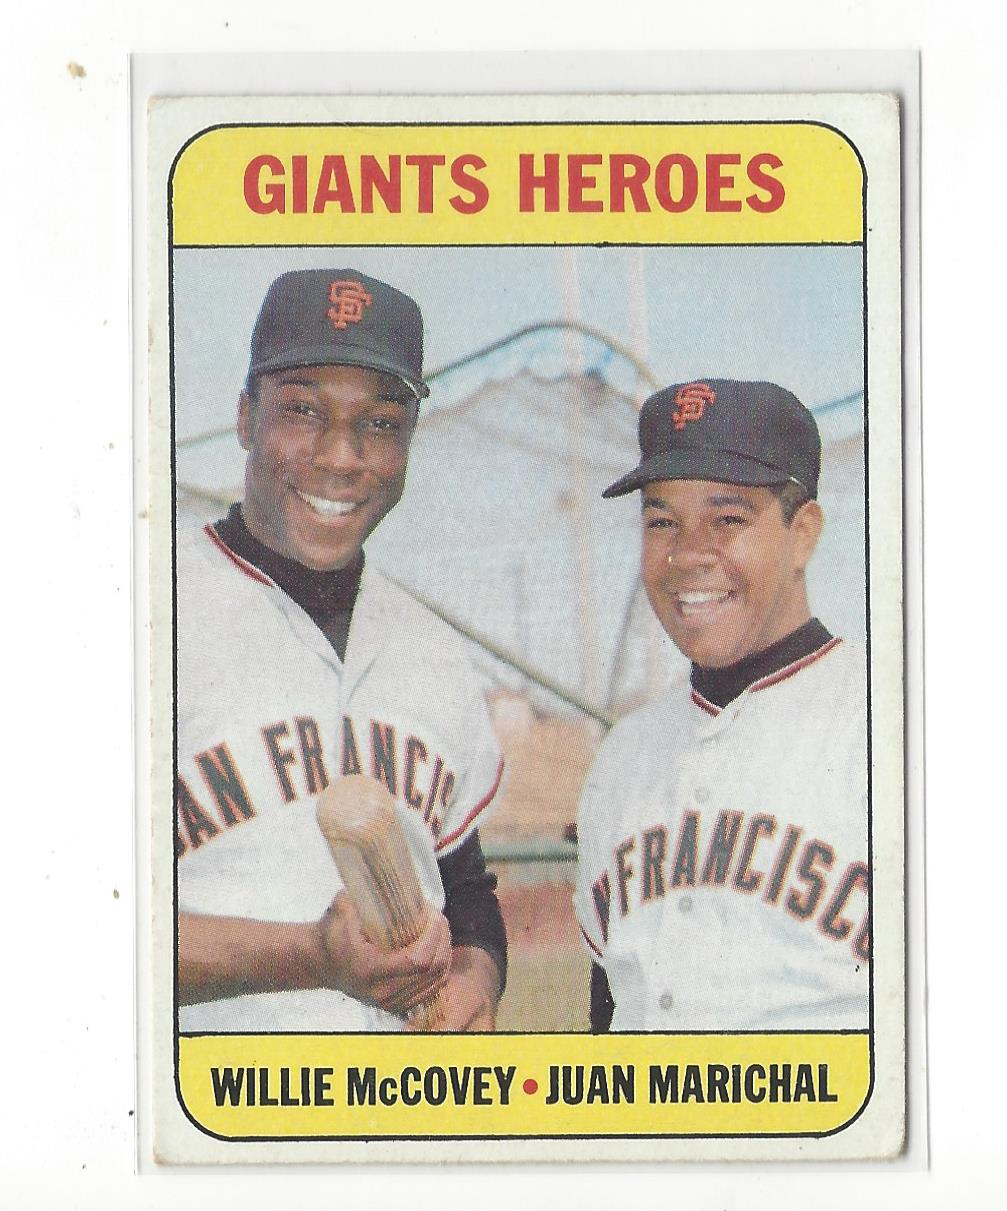 1969 Topps #572 Giants Heroes/Willie McCovey/Juan Marichal